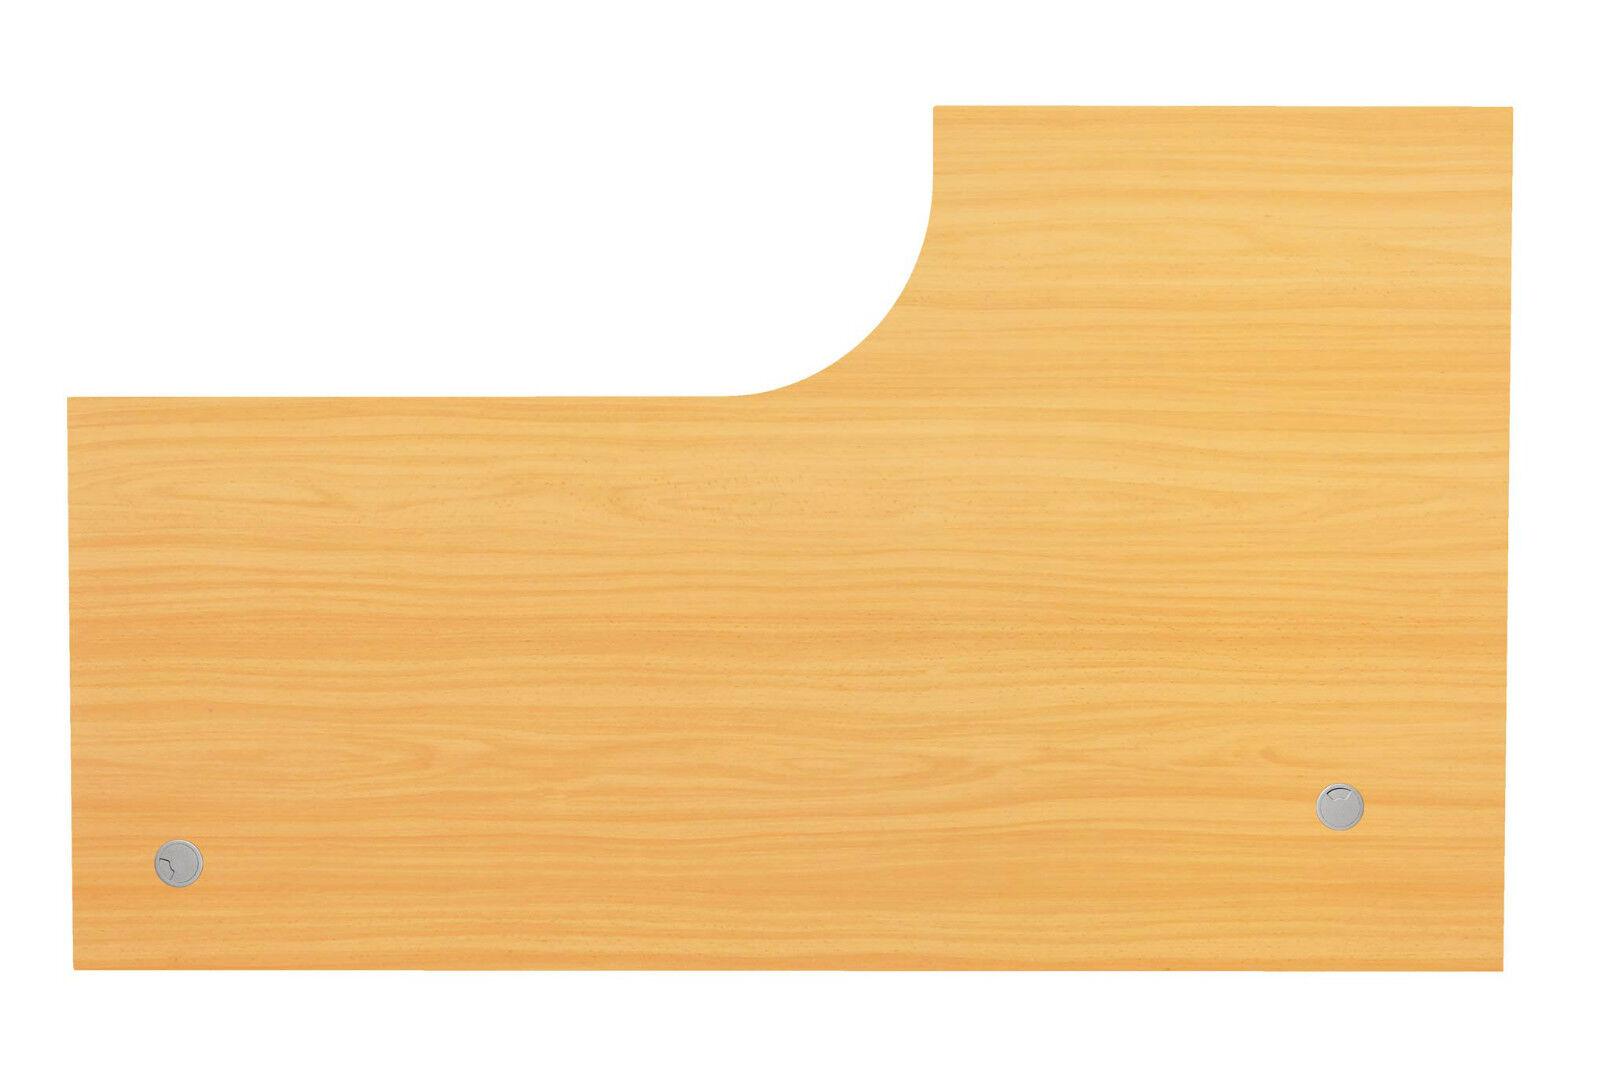 Tischplatte schreibtischplatte holz 200 x 120 cm l form for Tischplatte holz